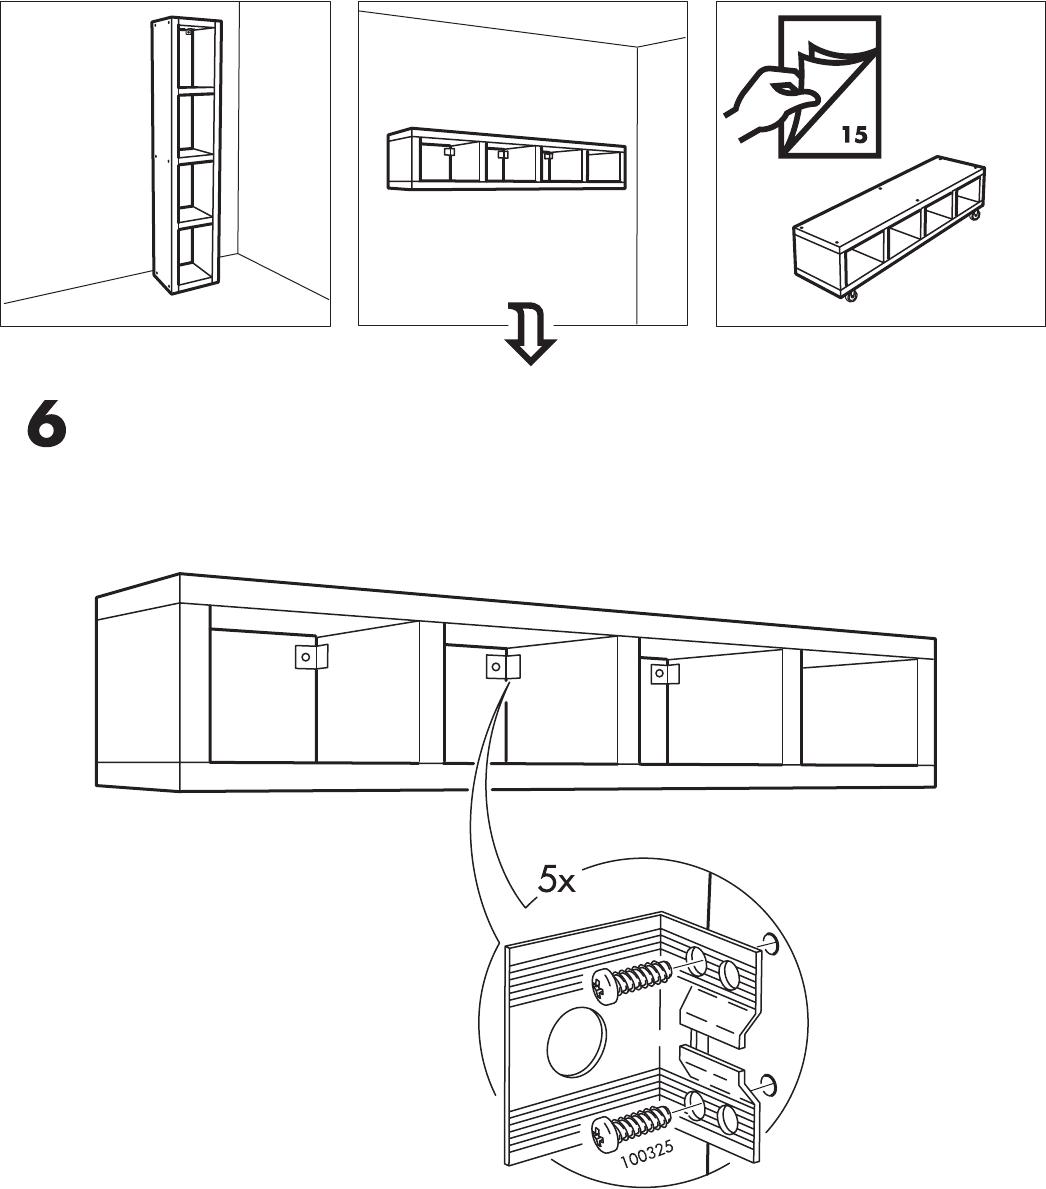 Handleiding Ikea Lack Kast Pagina 11 Van 16 Dansk